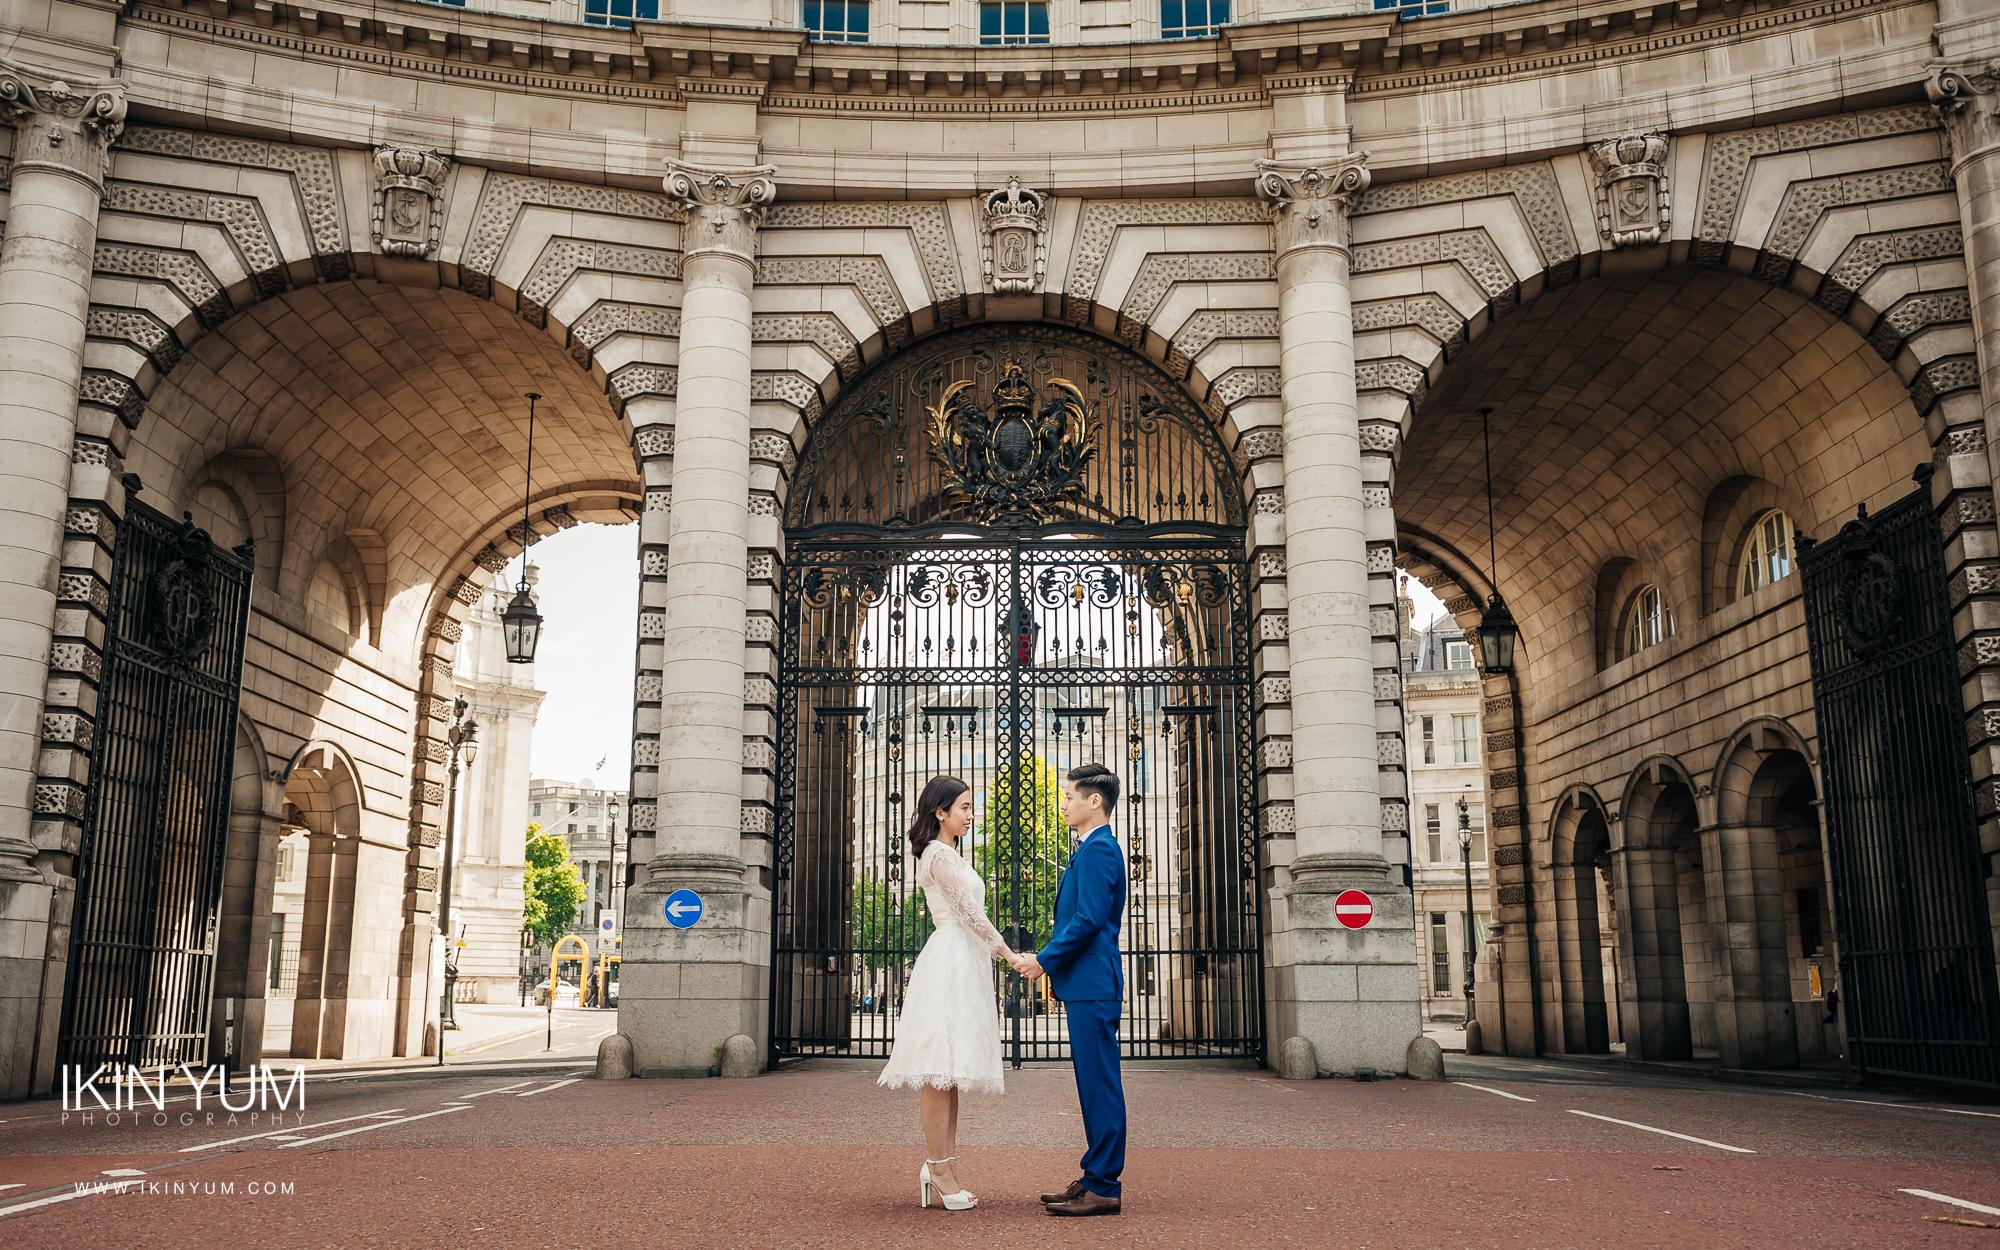 Natalie & Duncan Wedding Day - Ikin Yum Photography-043.jpg